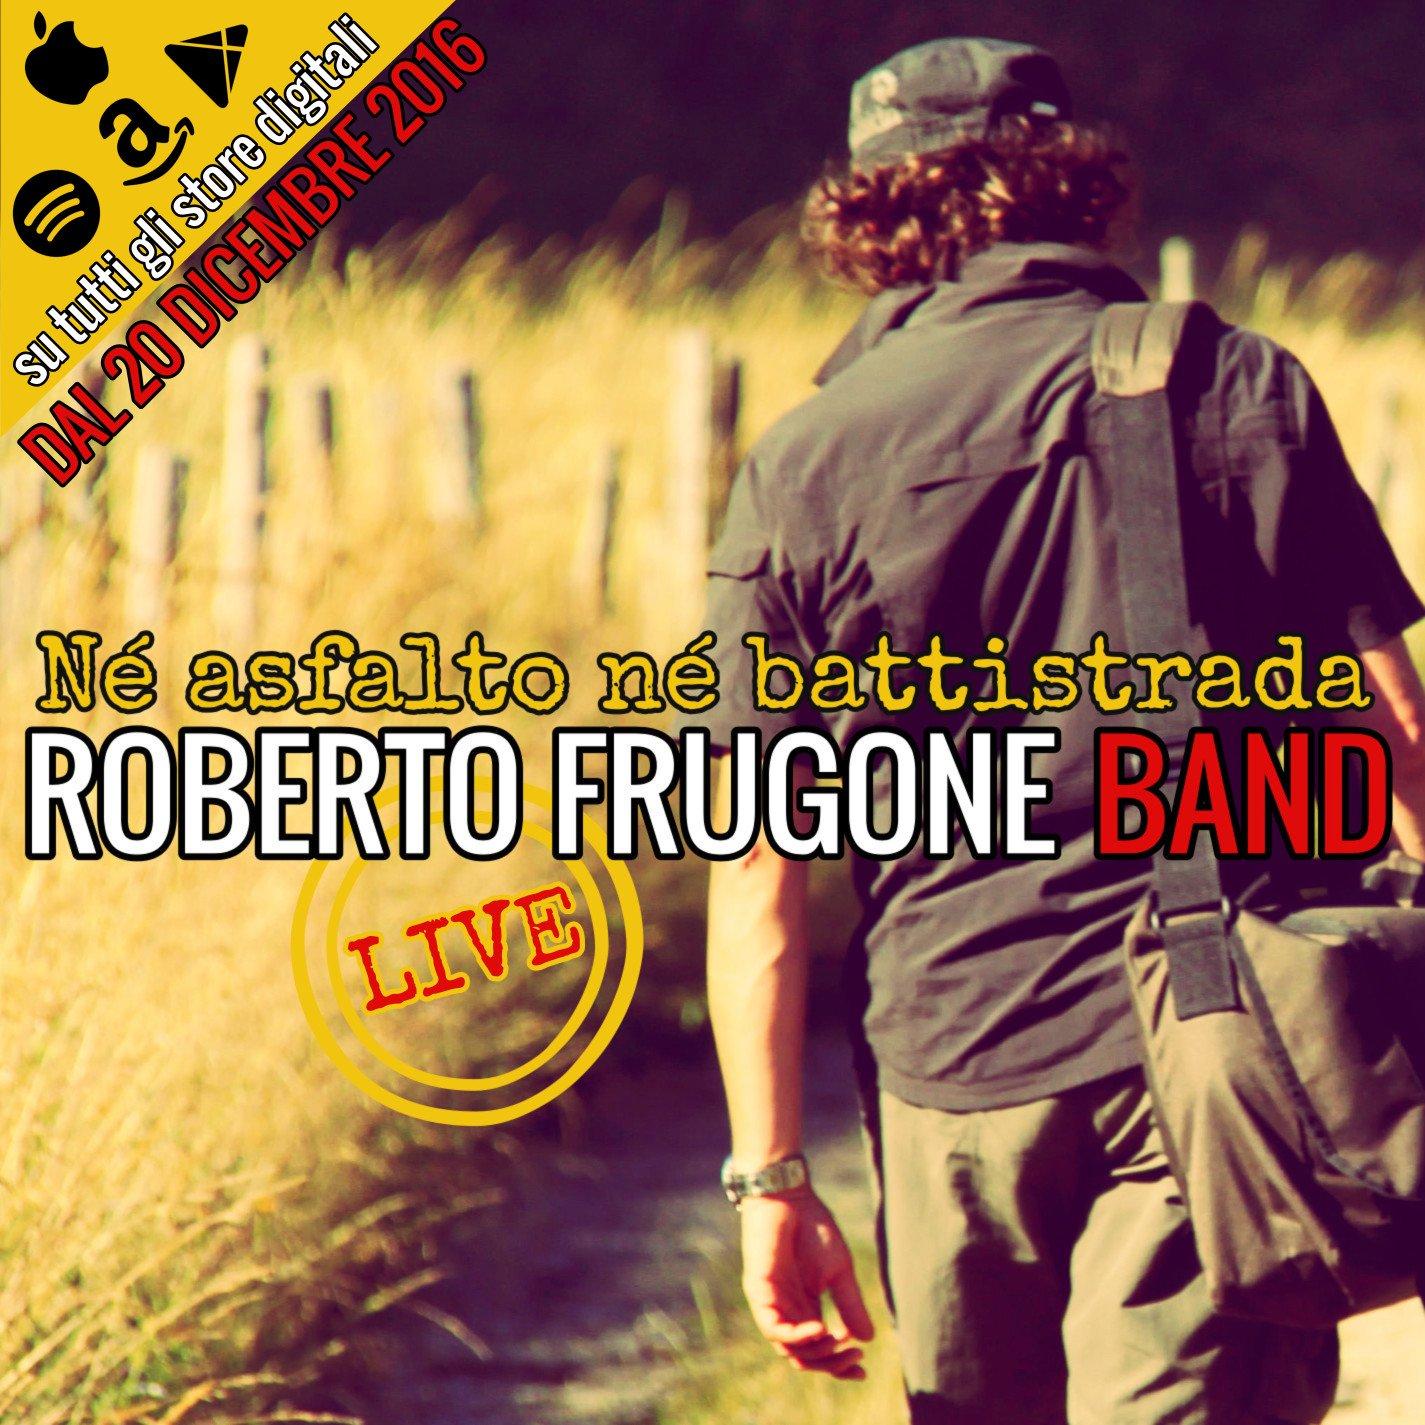 Né asfalto né battistrada - Roberto Frugone Band live promo